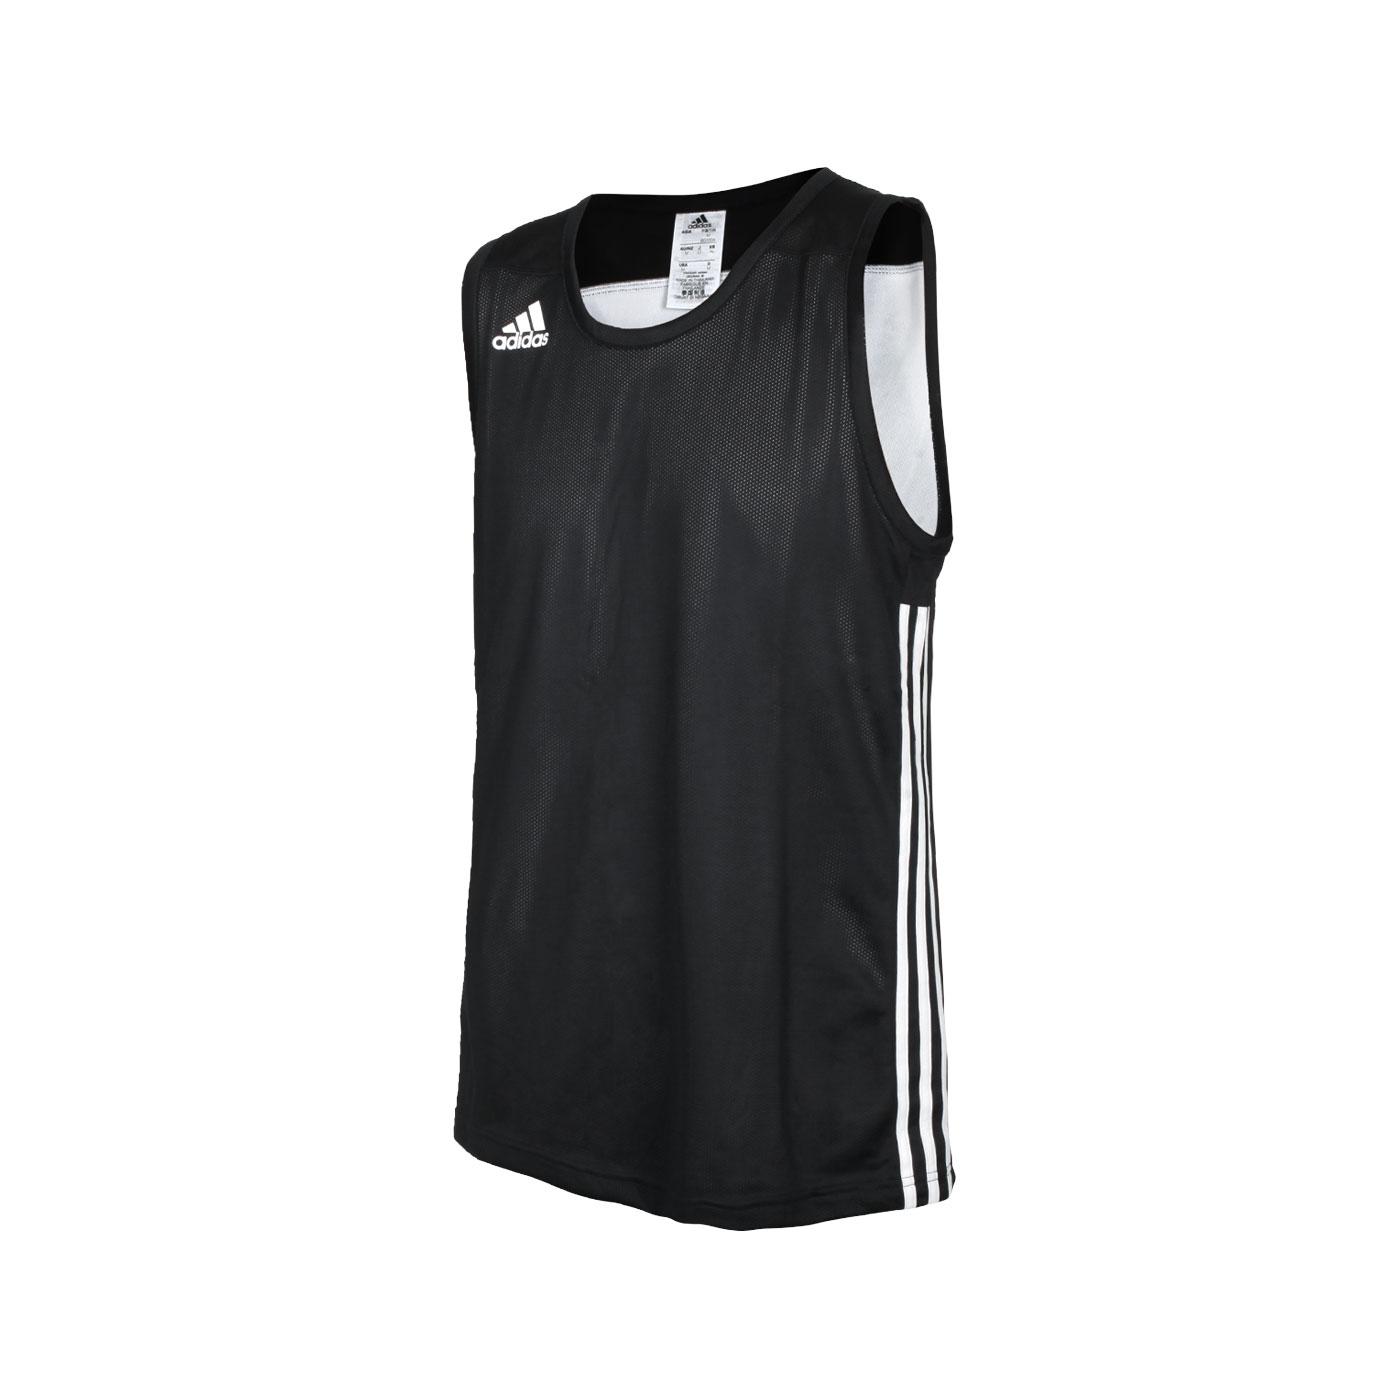 ADIDAS 男款籃球雙面運動背心 DX6385